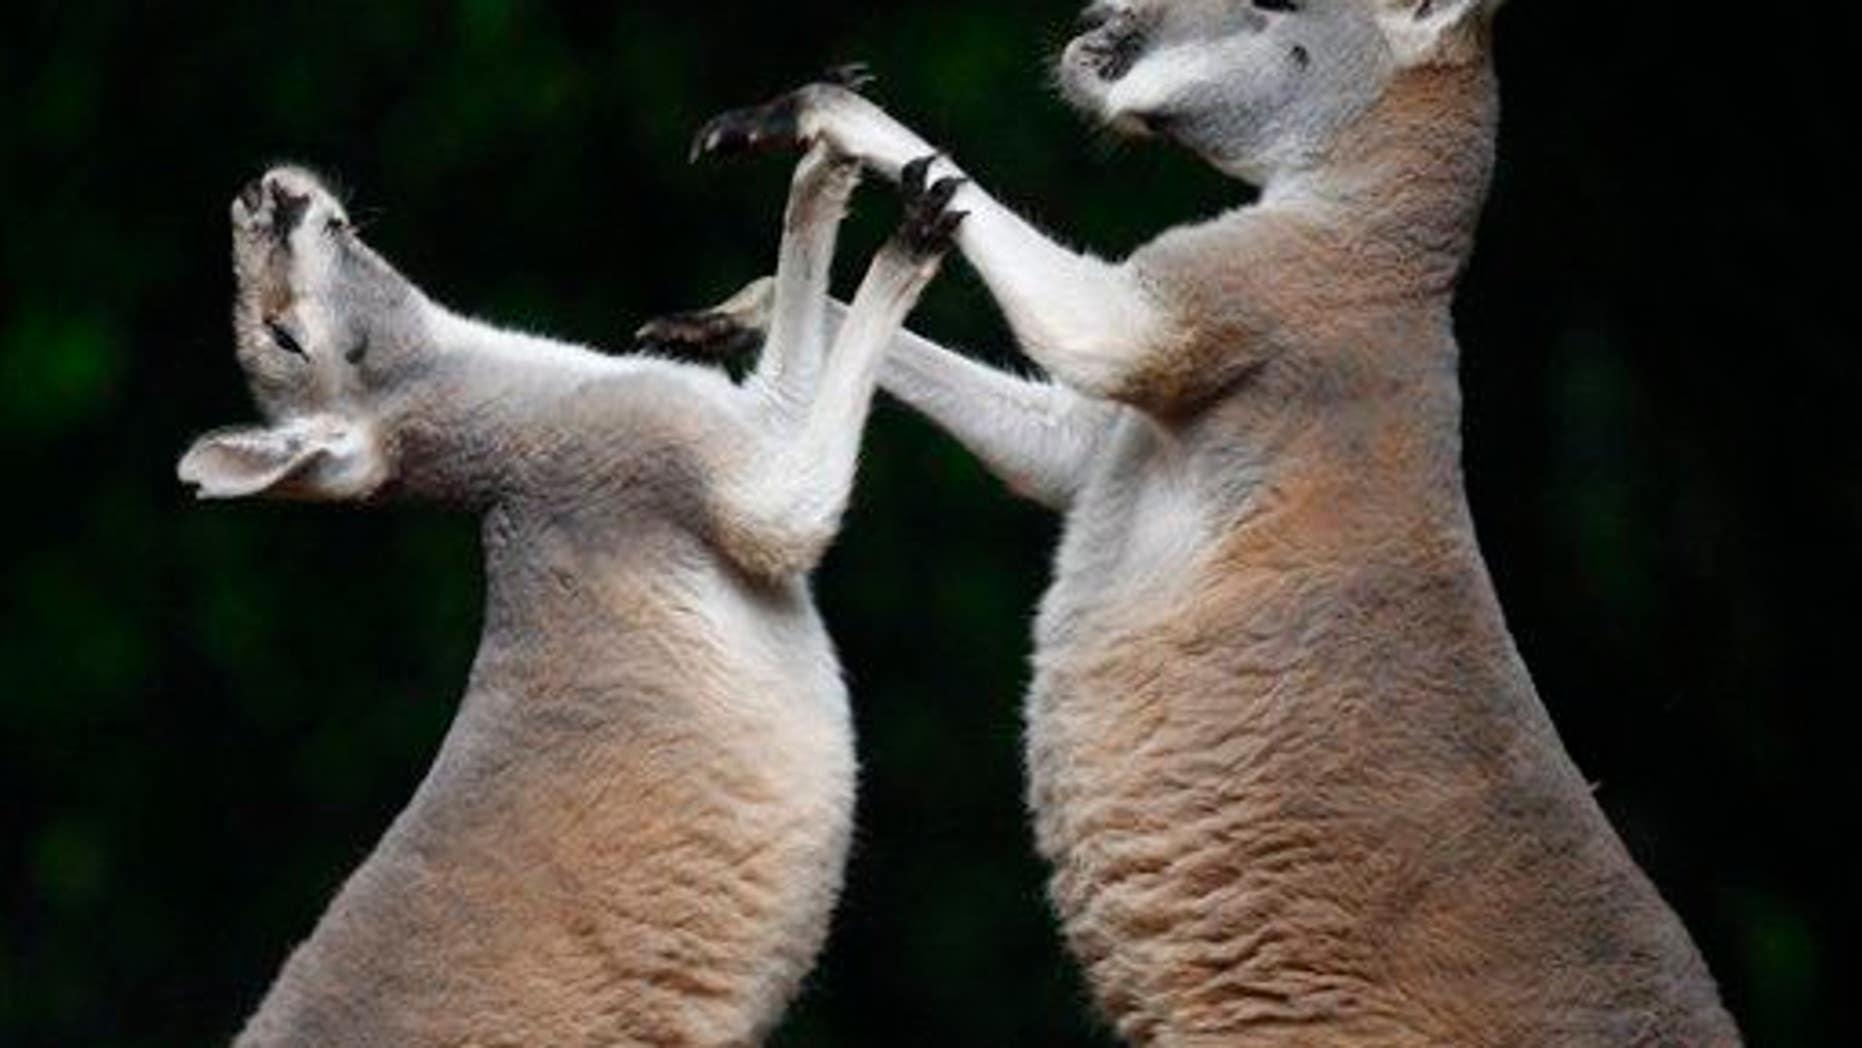 Two kangaroos fight at Hanover Zoo, Hanover,  northern Germany,  Friday, Aug. 15, 2008.